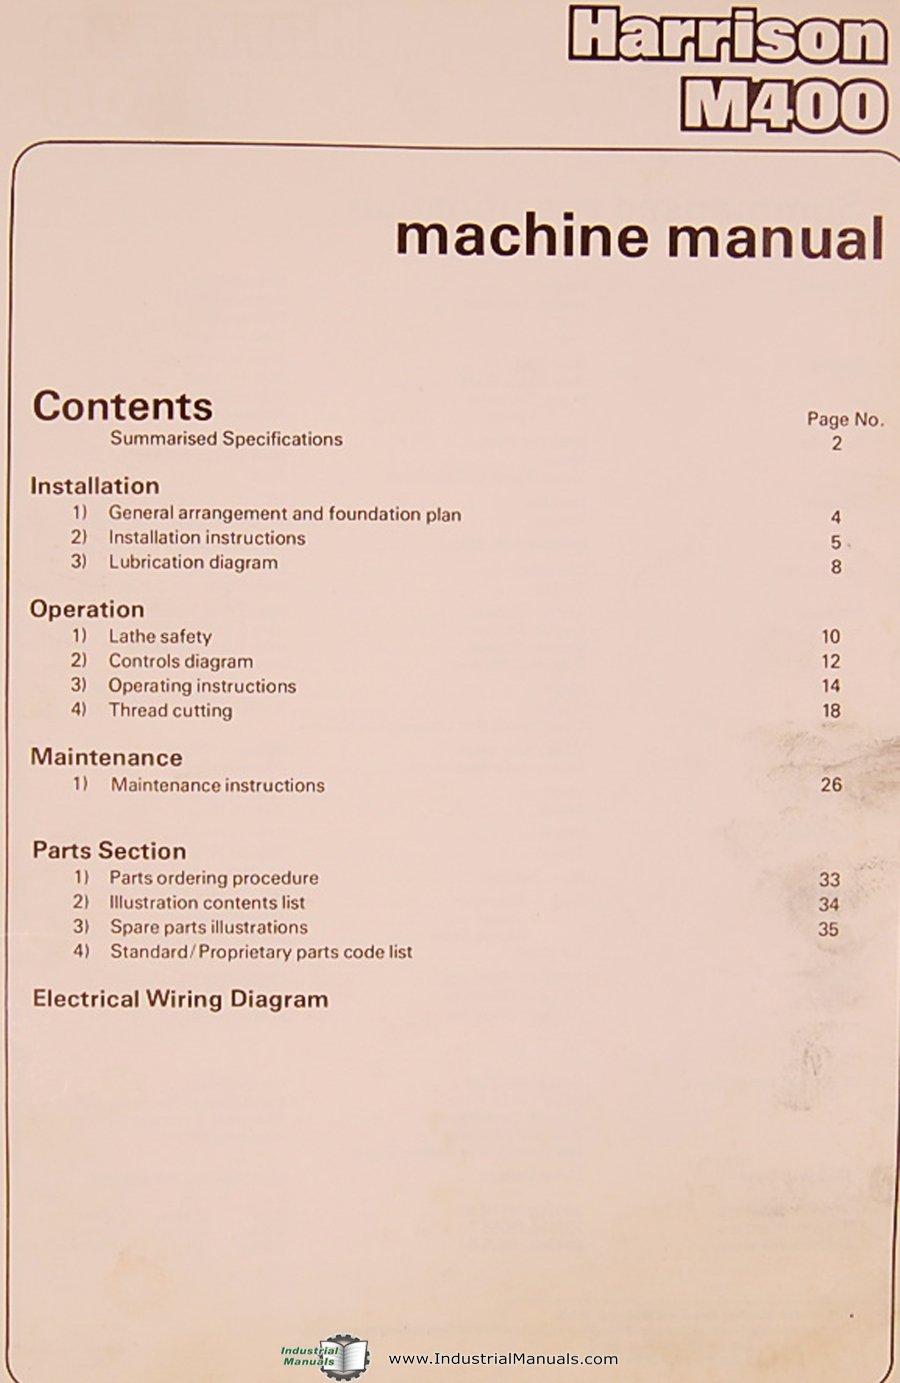 Harrison M400, 420mm Centre Lathe, Operations Parts & Electrical Manual:  Harrison: Amazon.com: Books